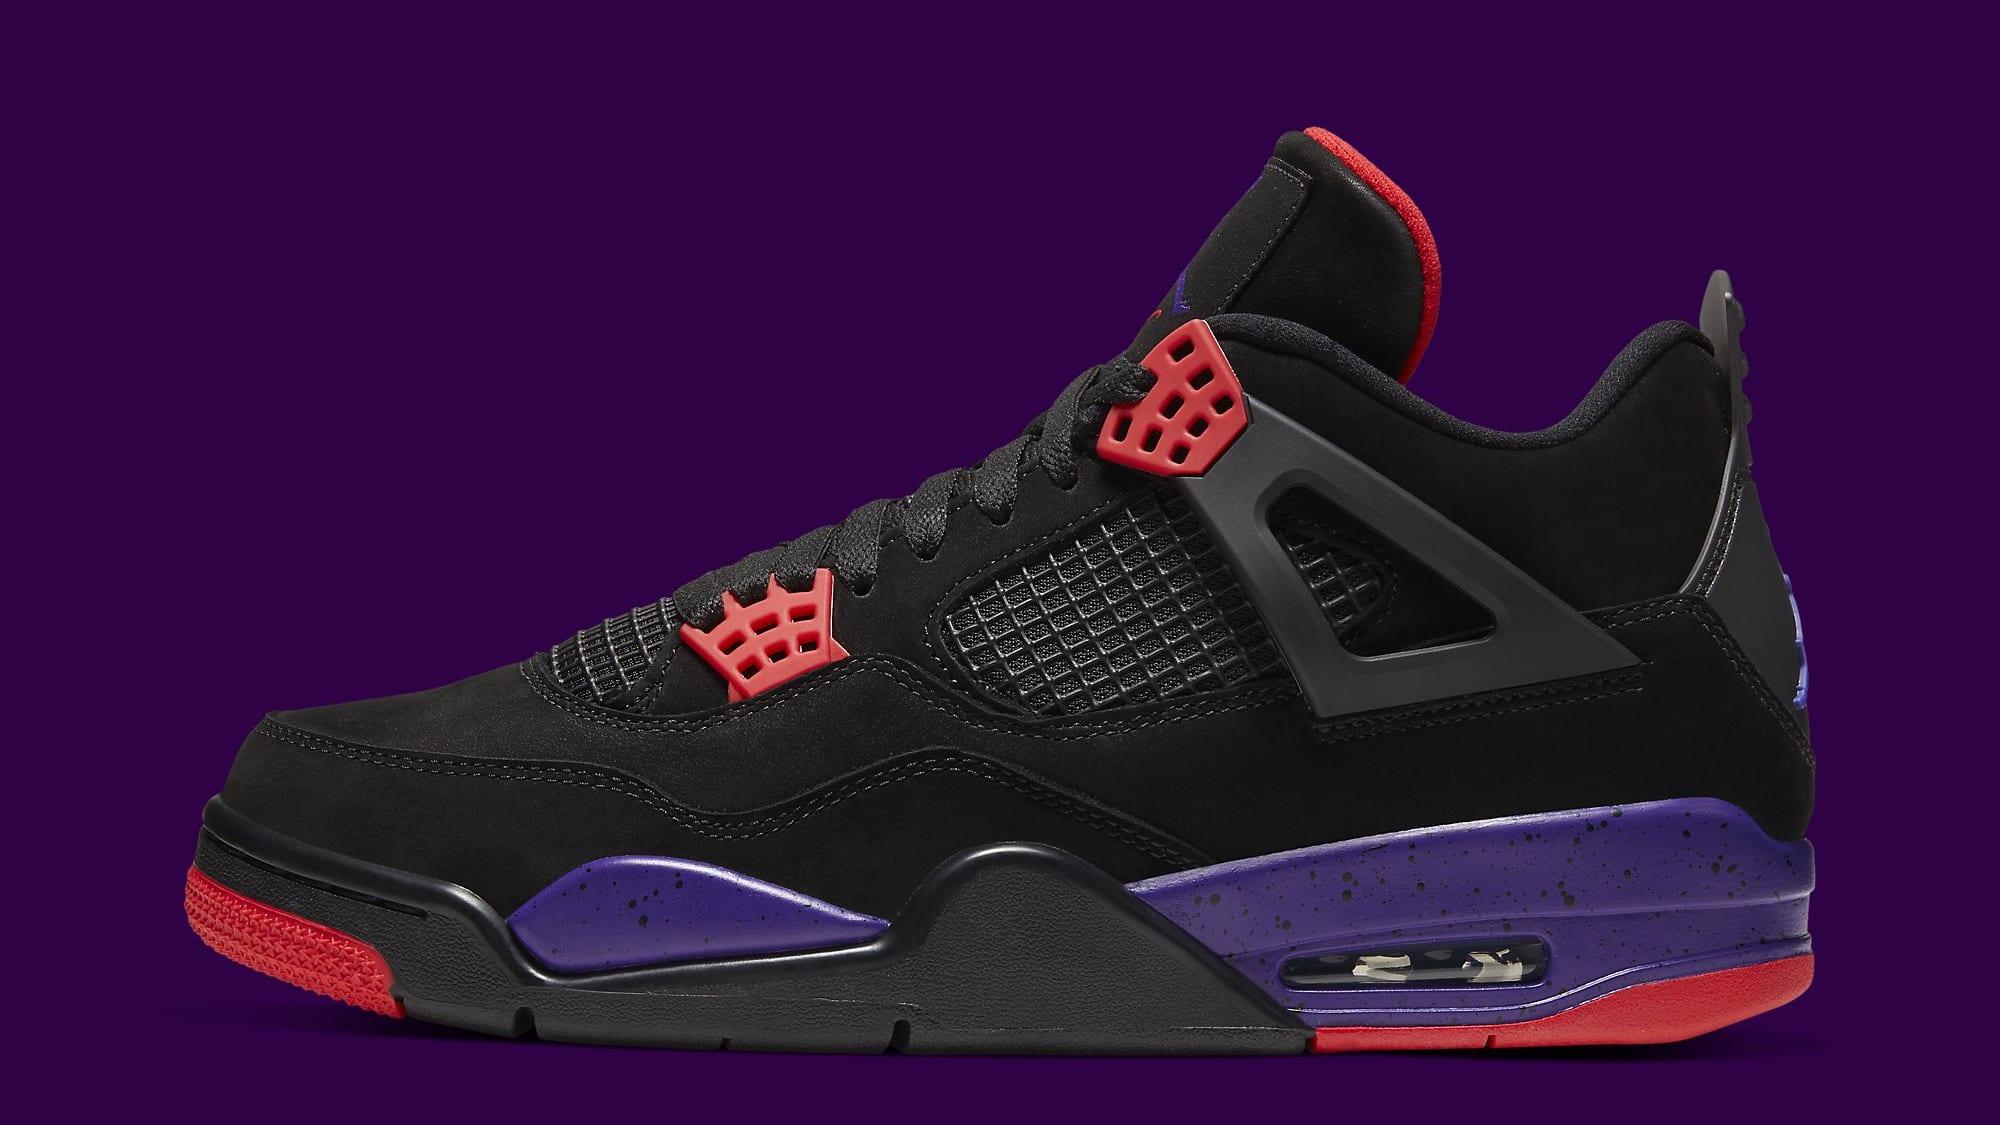 179454baff8 Air Jordan 4 'Raptors' Release Date Jun. 2, 2019 AQ3816-056 | Sole ...